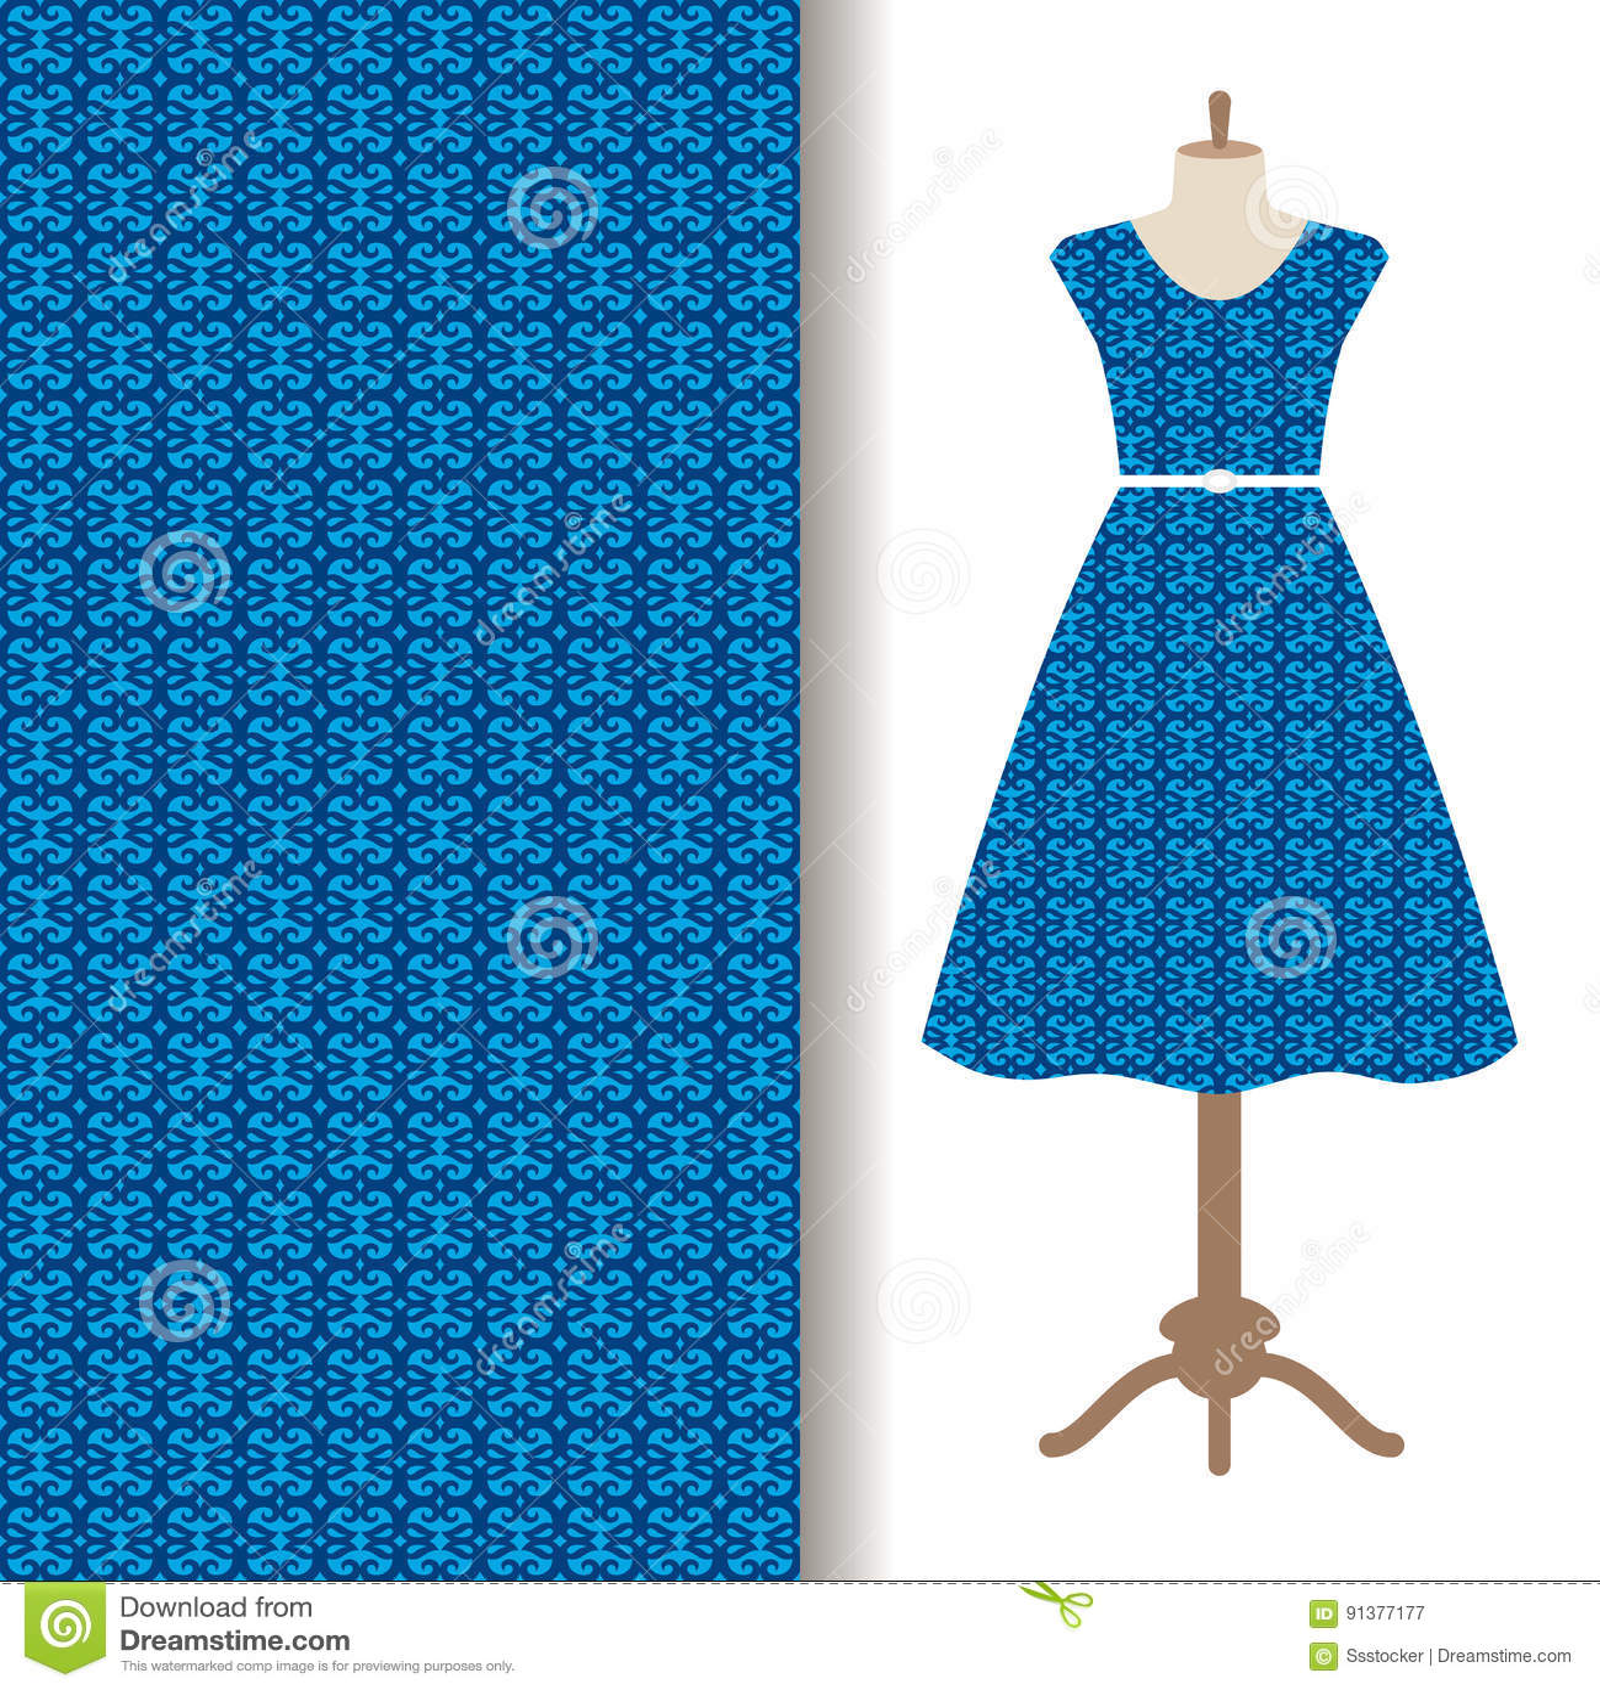 Dress fabric with blue arabic pattern